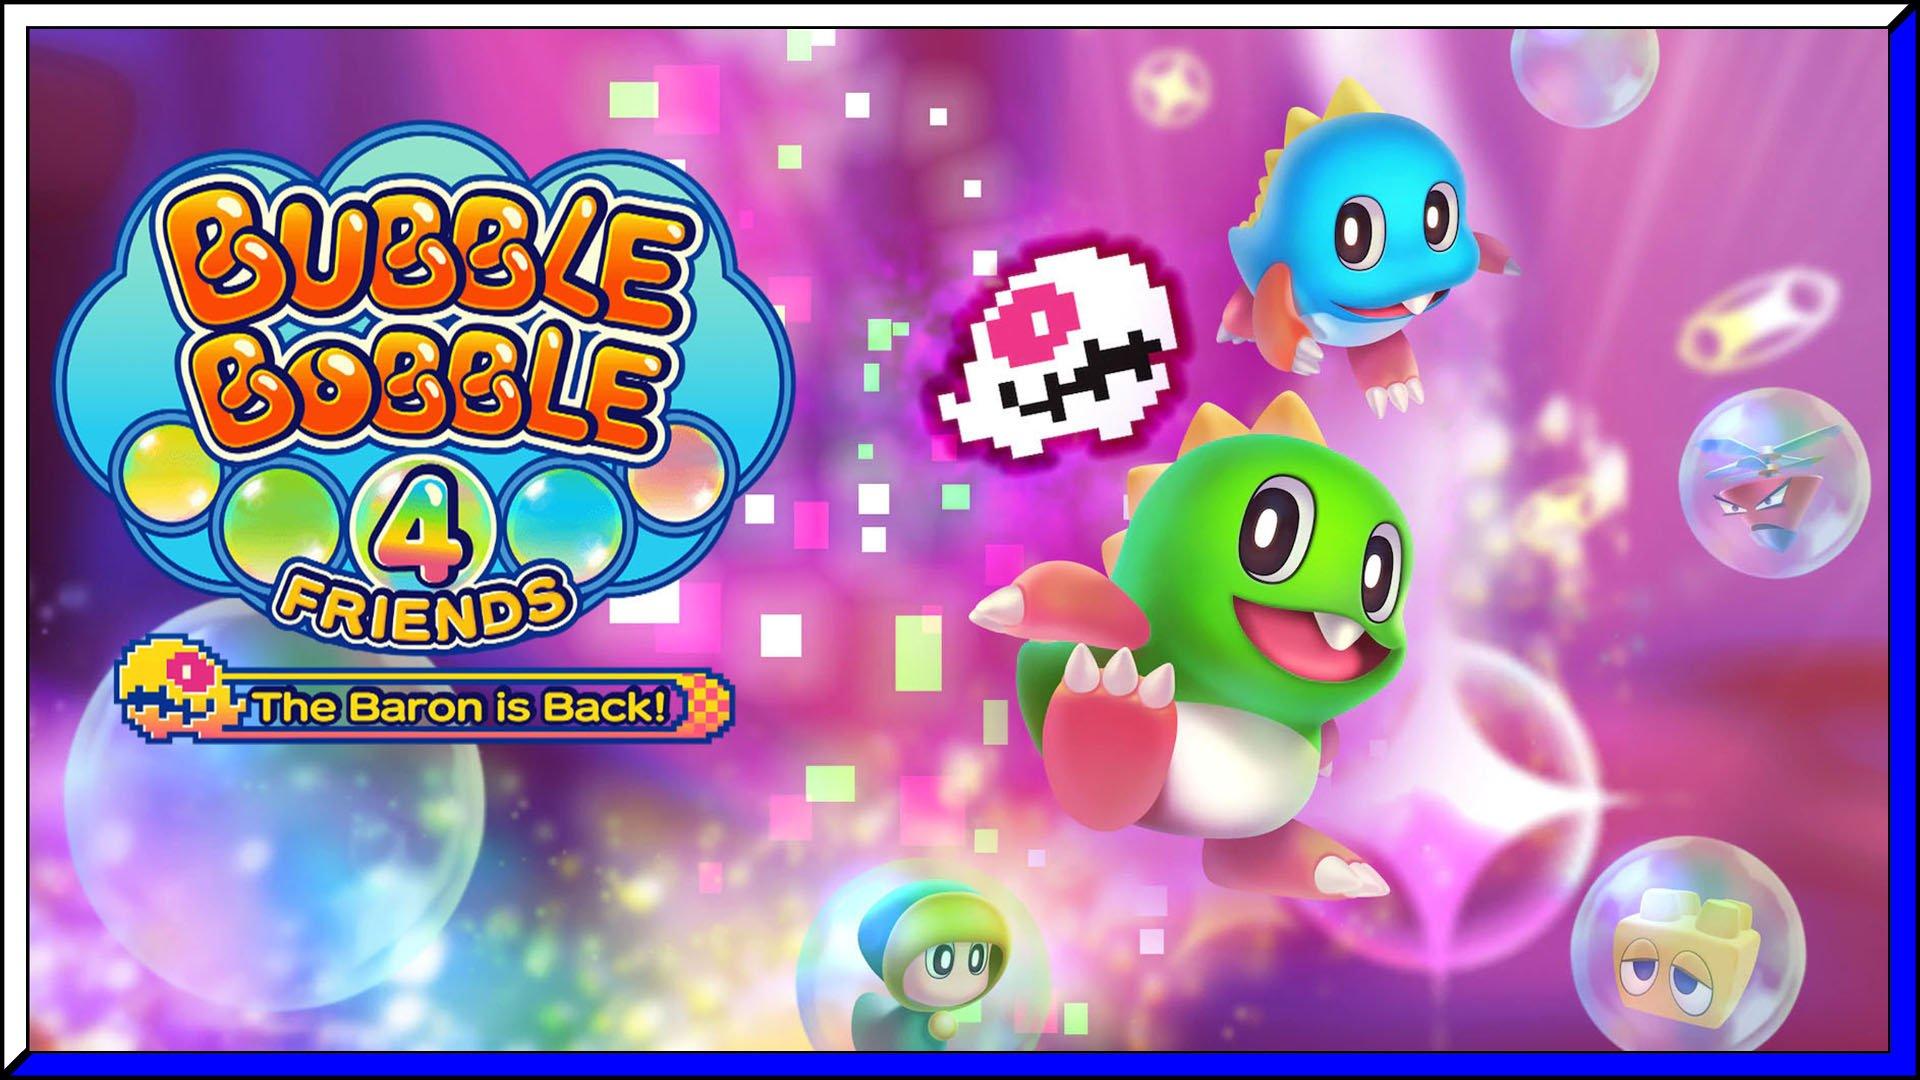 Bubble Bobble 4 Friends: The Baron is Back! (PS5) Review | via PS4 BC